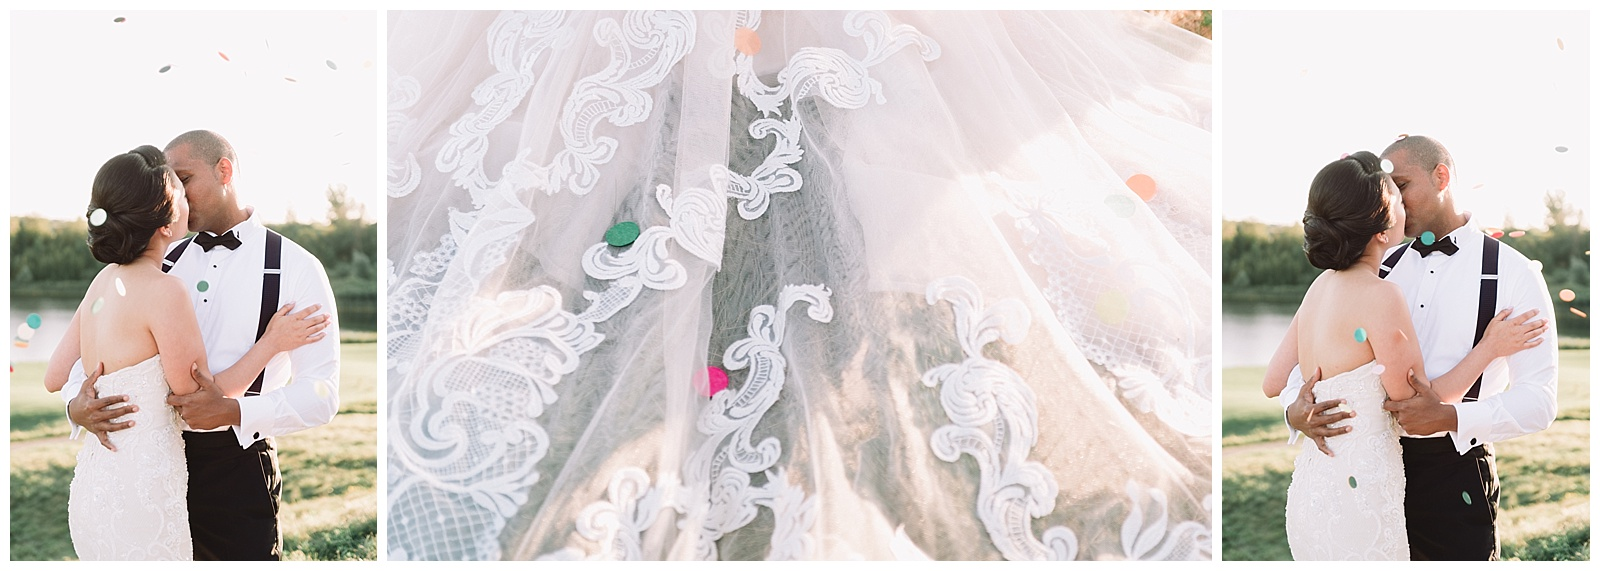 destination wedding photographer+canada+popcornphotography_0057.jpg